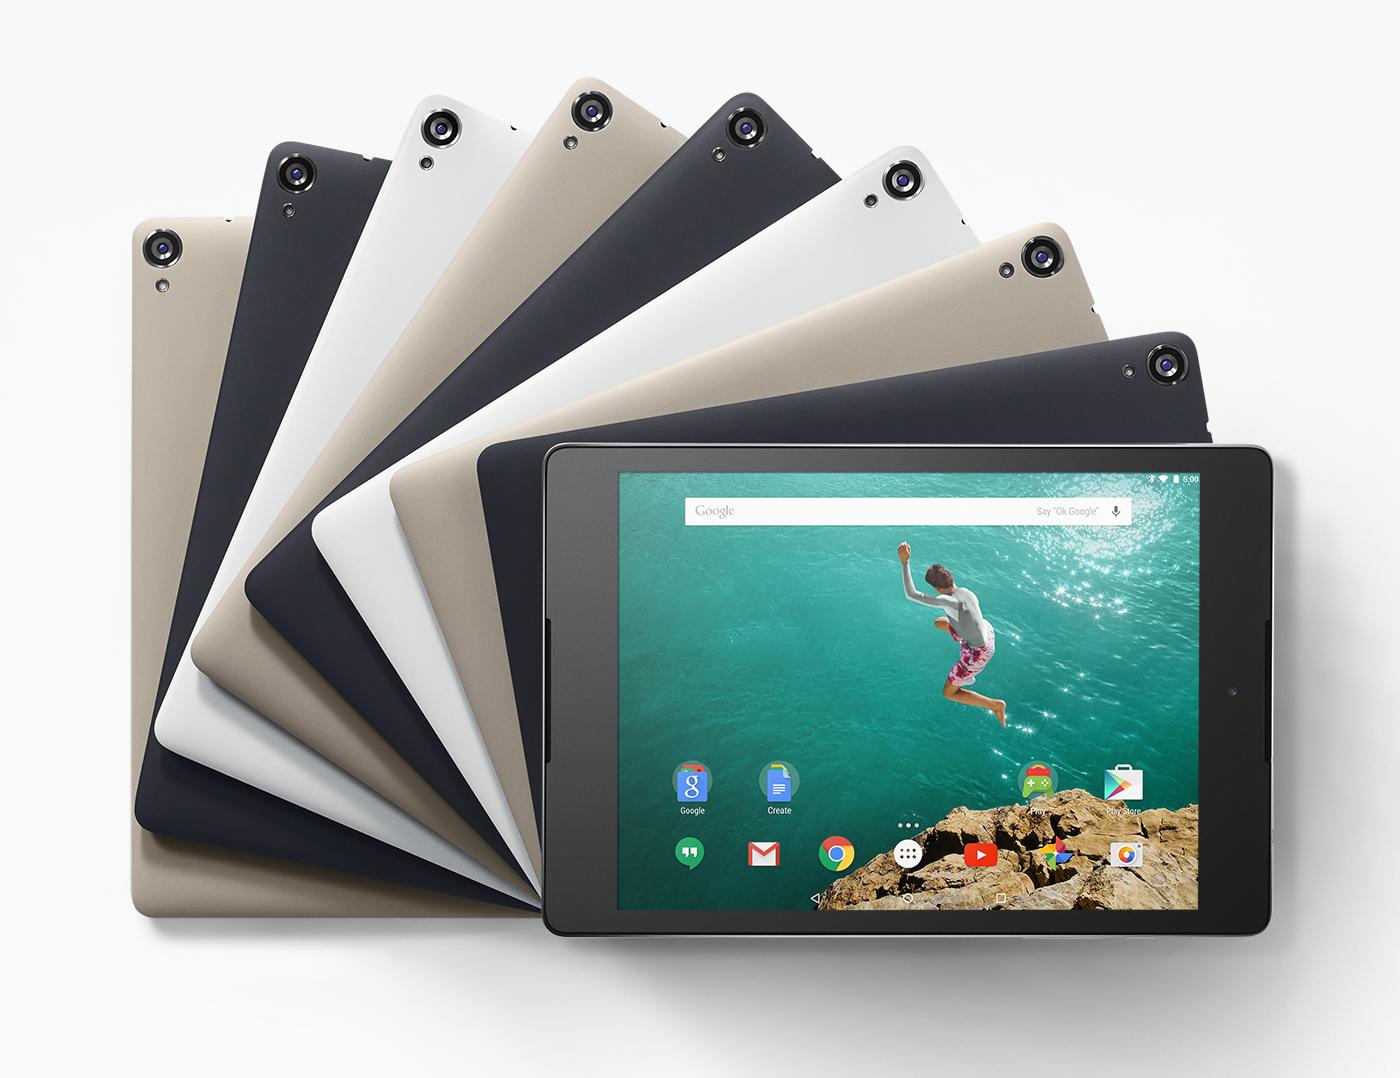 mejores tablets 2015 Nexus 9